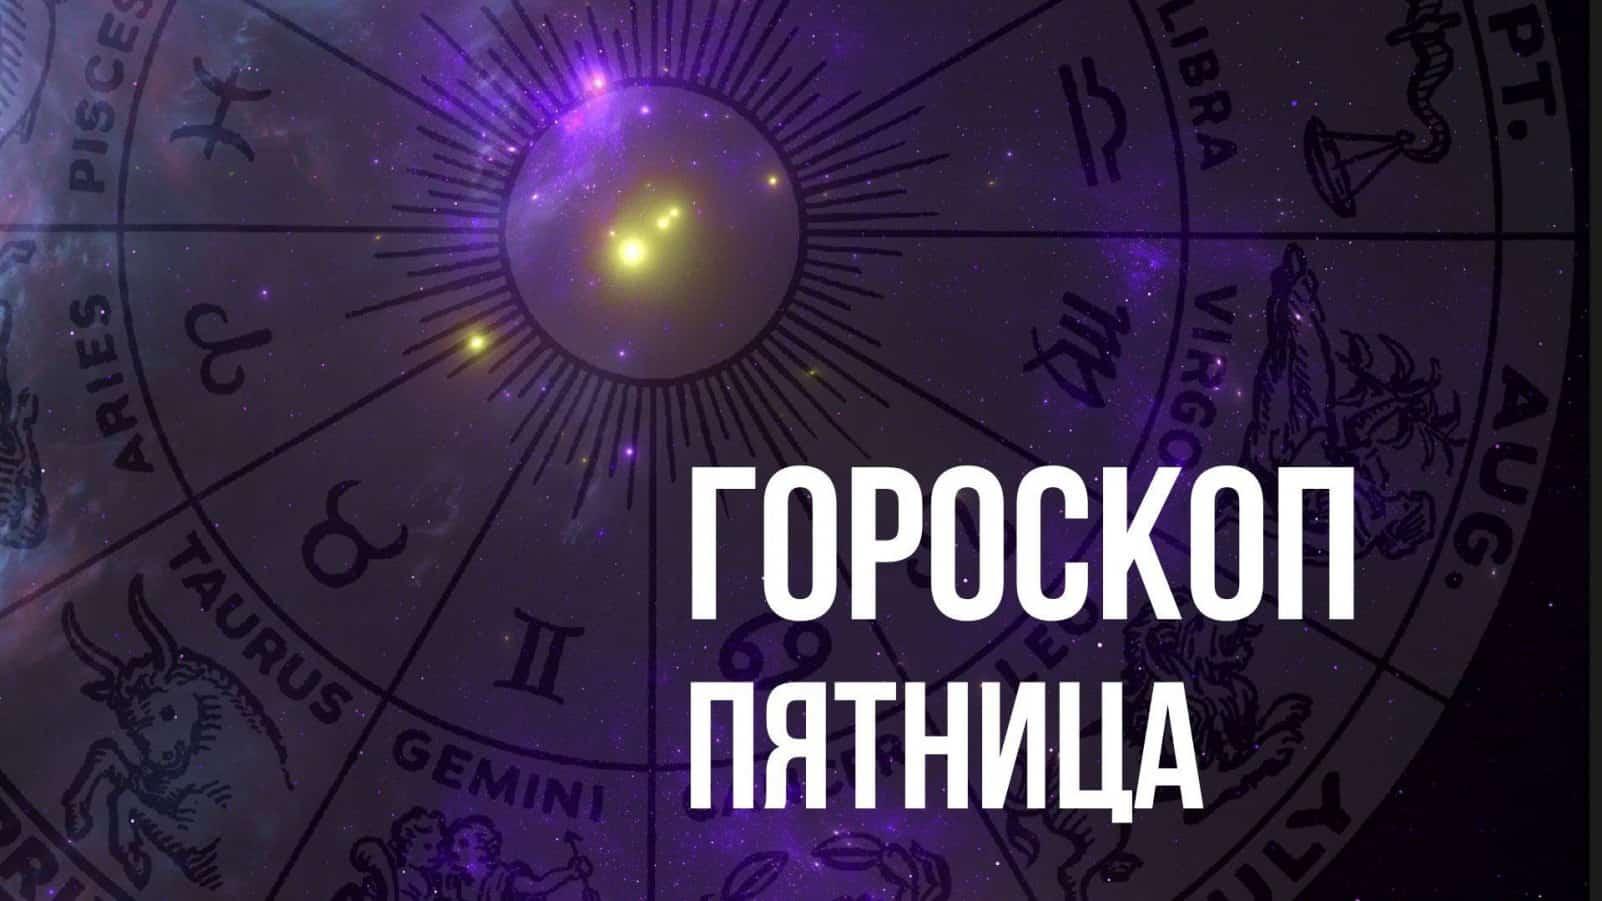 Гороскоп на пятницу 20 августа для каждого знака Зодиака